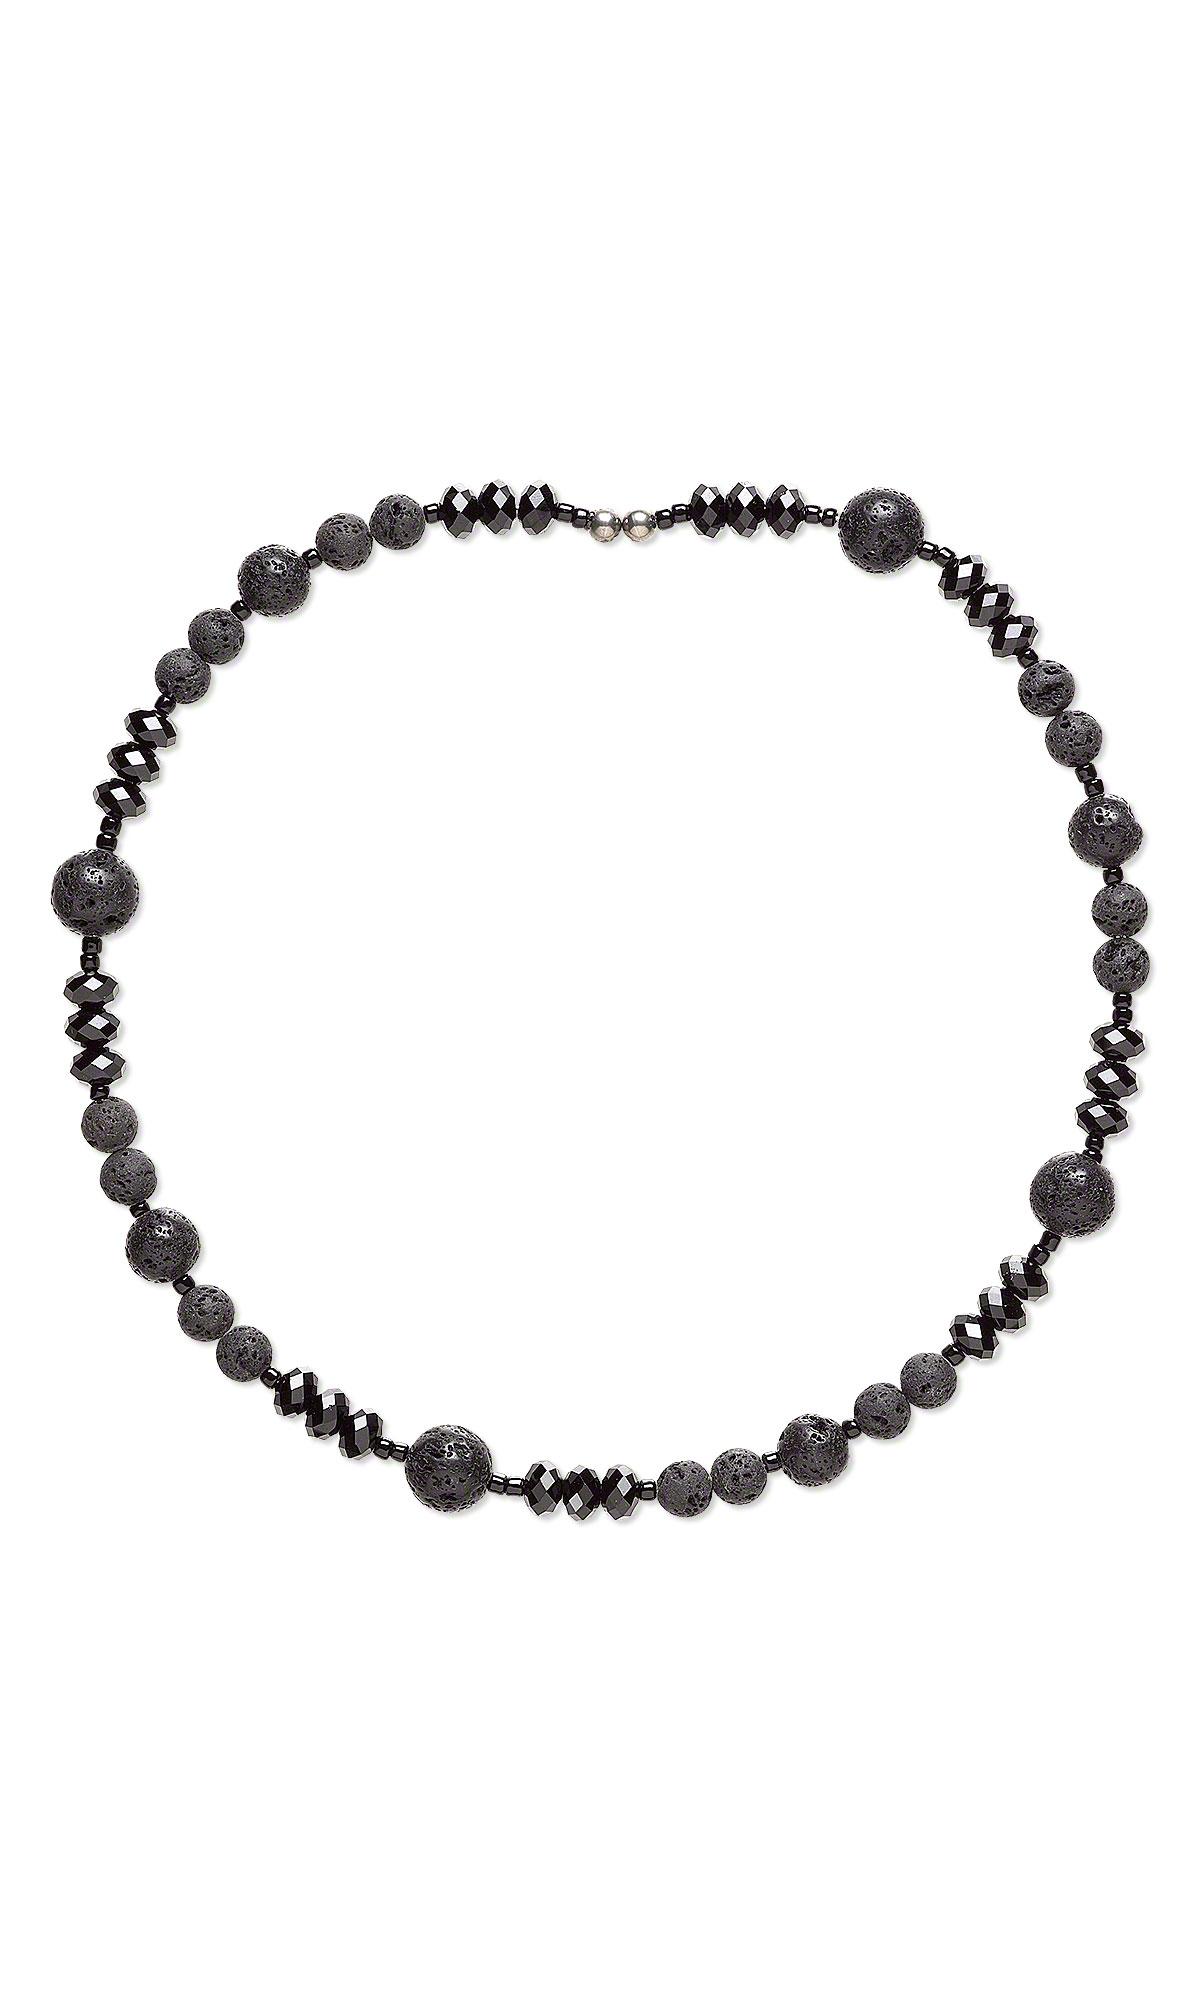 Jewelry Design - Memory Wire Necklace with Swarovski Crystal, Lava ...